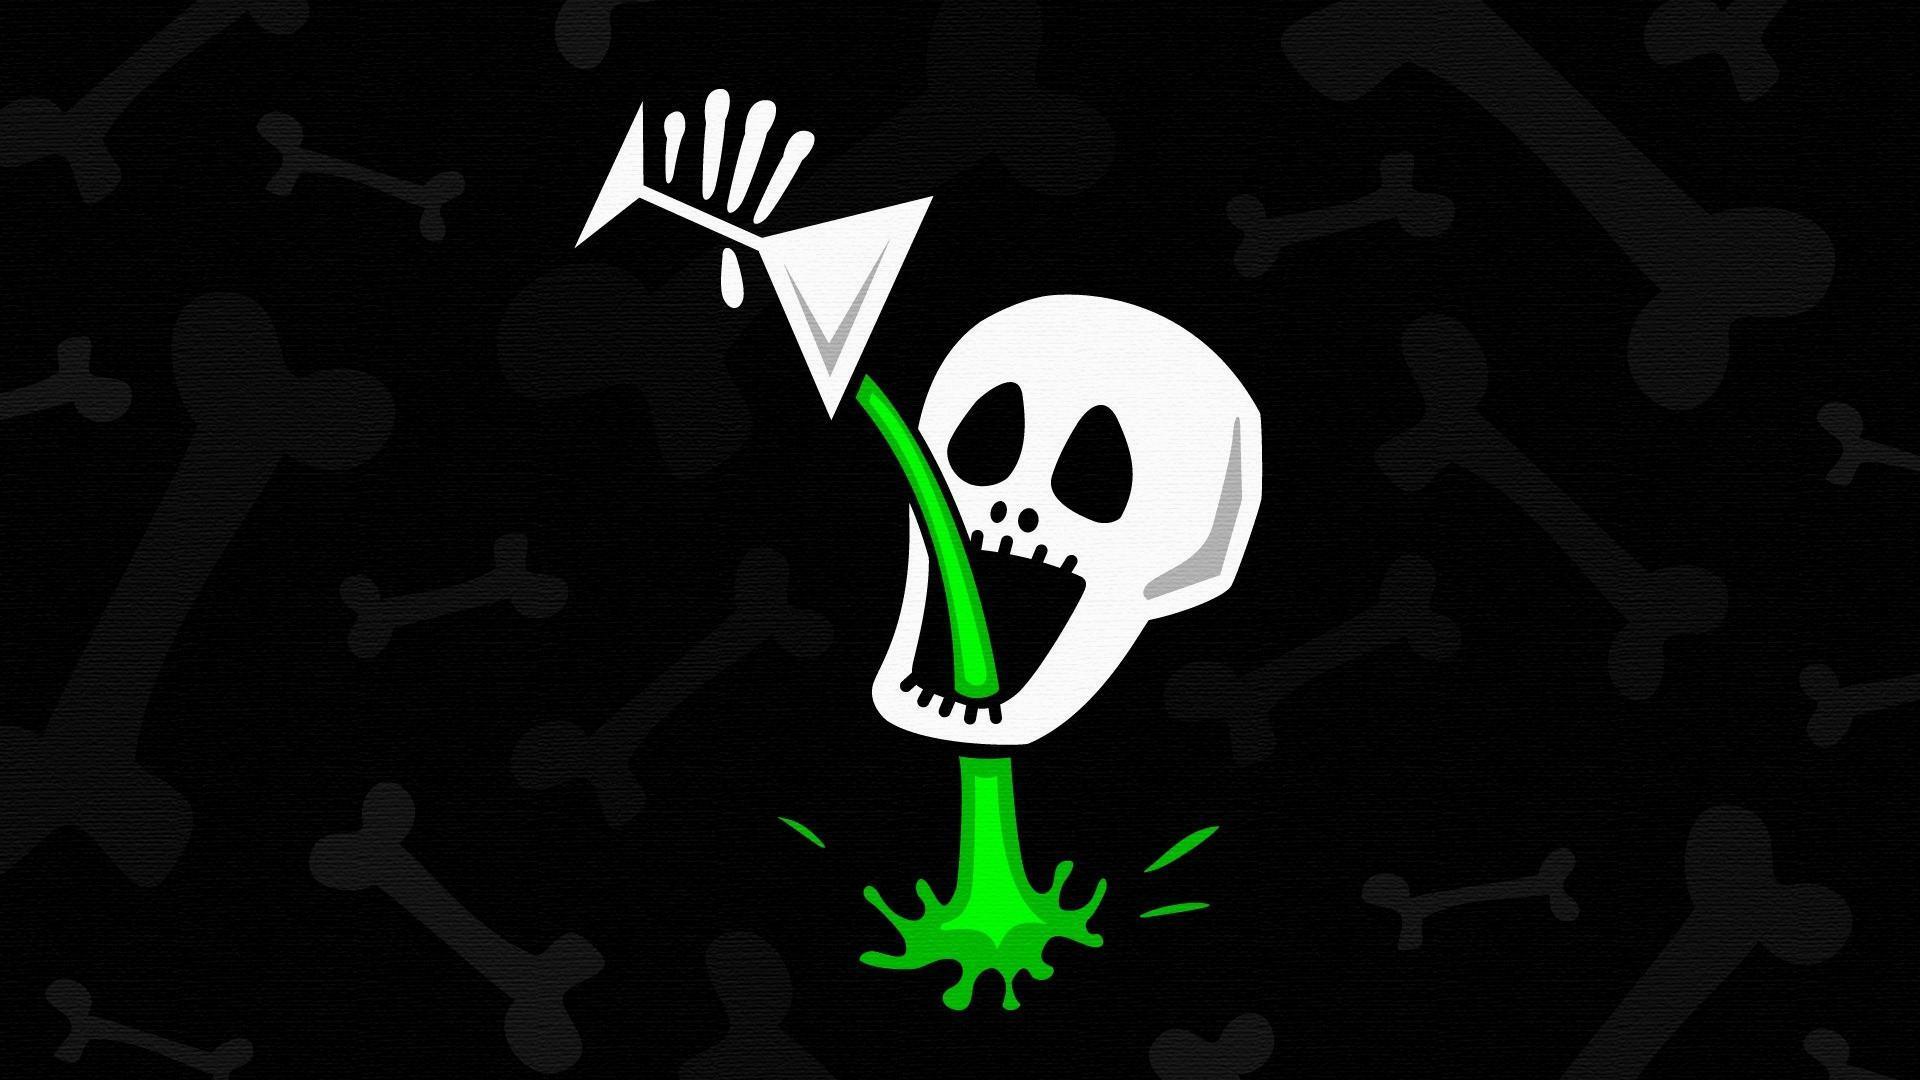 Death skull wallpaper, HD Desktop Wallpapers 1920x1080